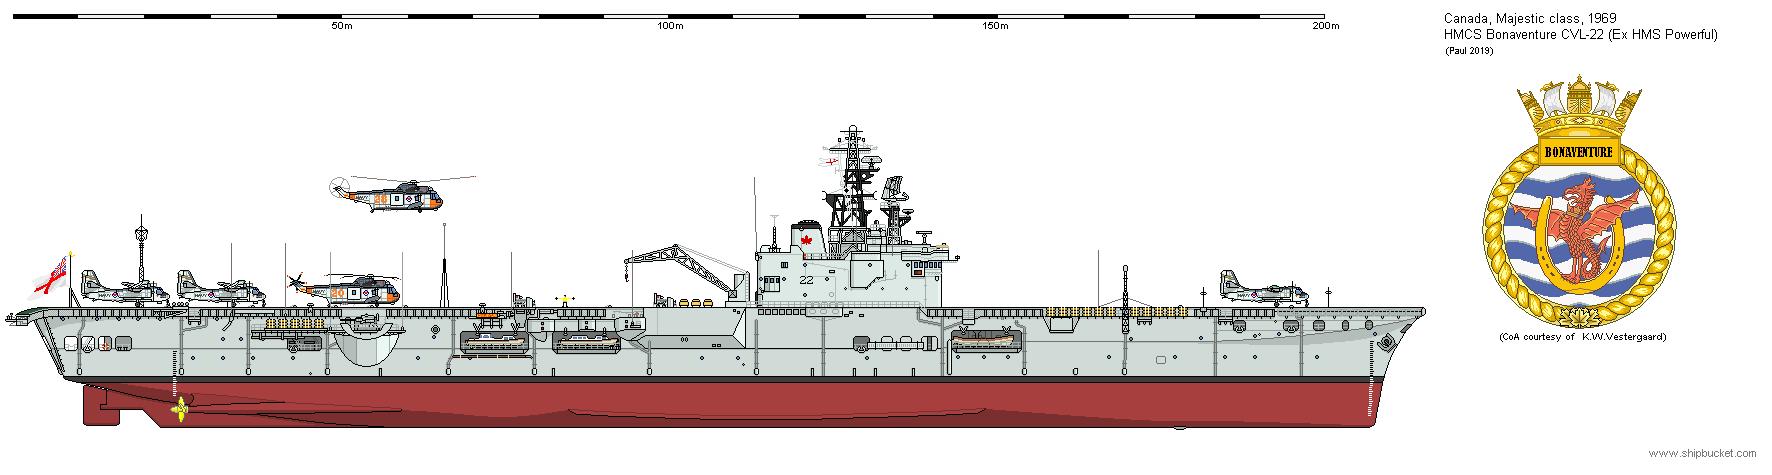 CA CVL22 Majestic Class Bonaventure-1969